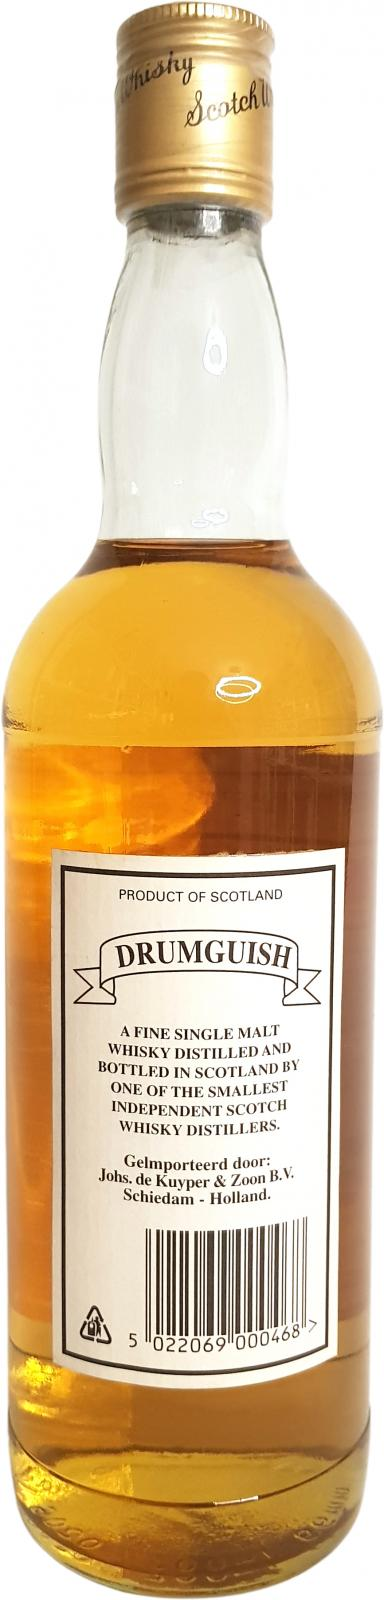 Drumguish Single Highland Malt